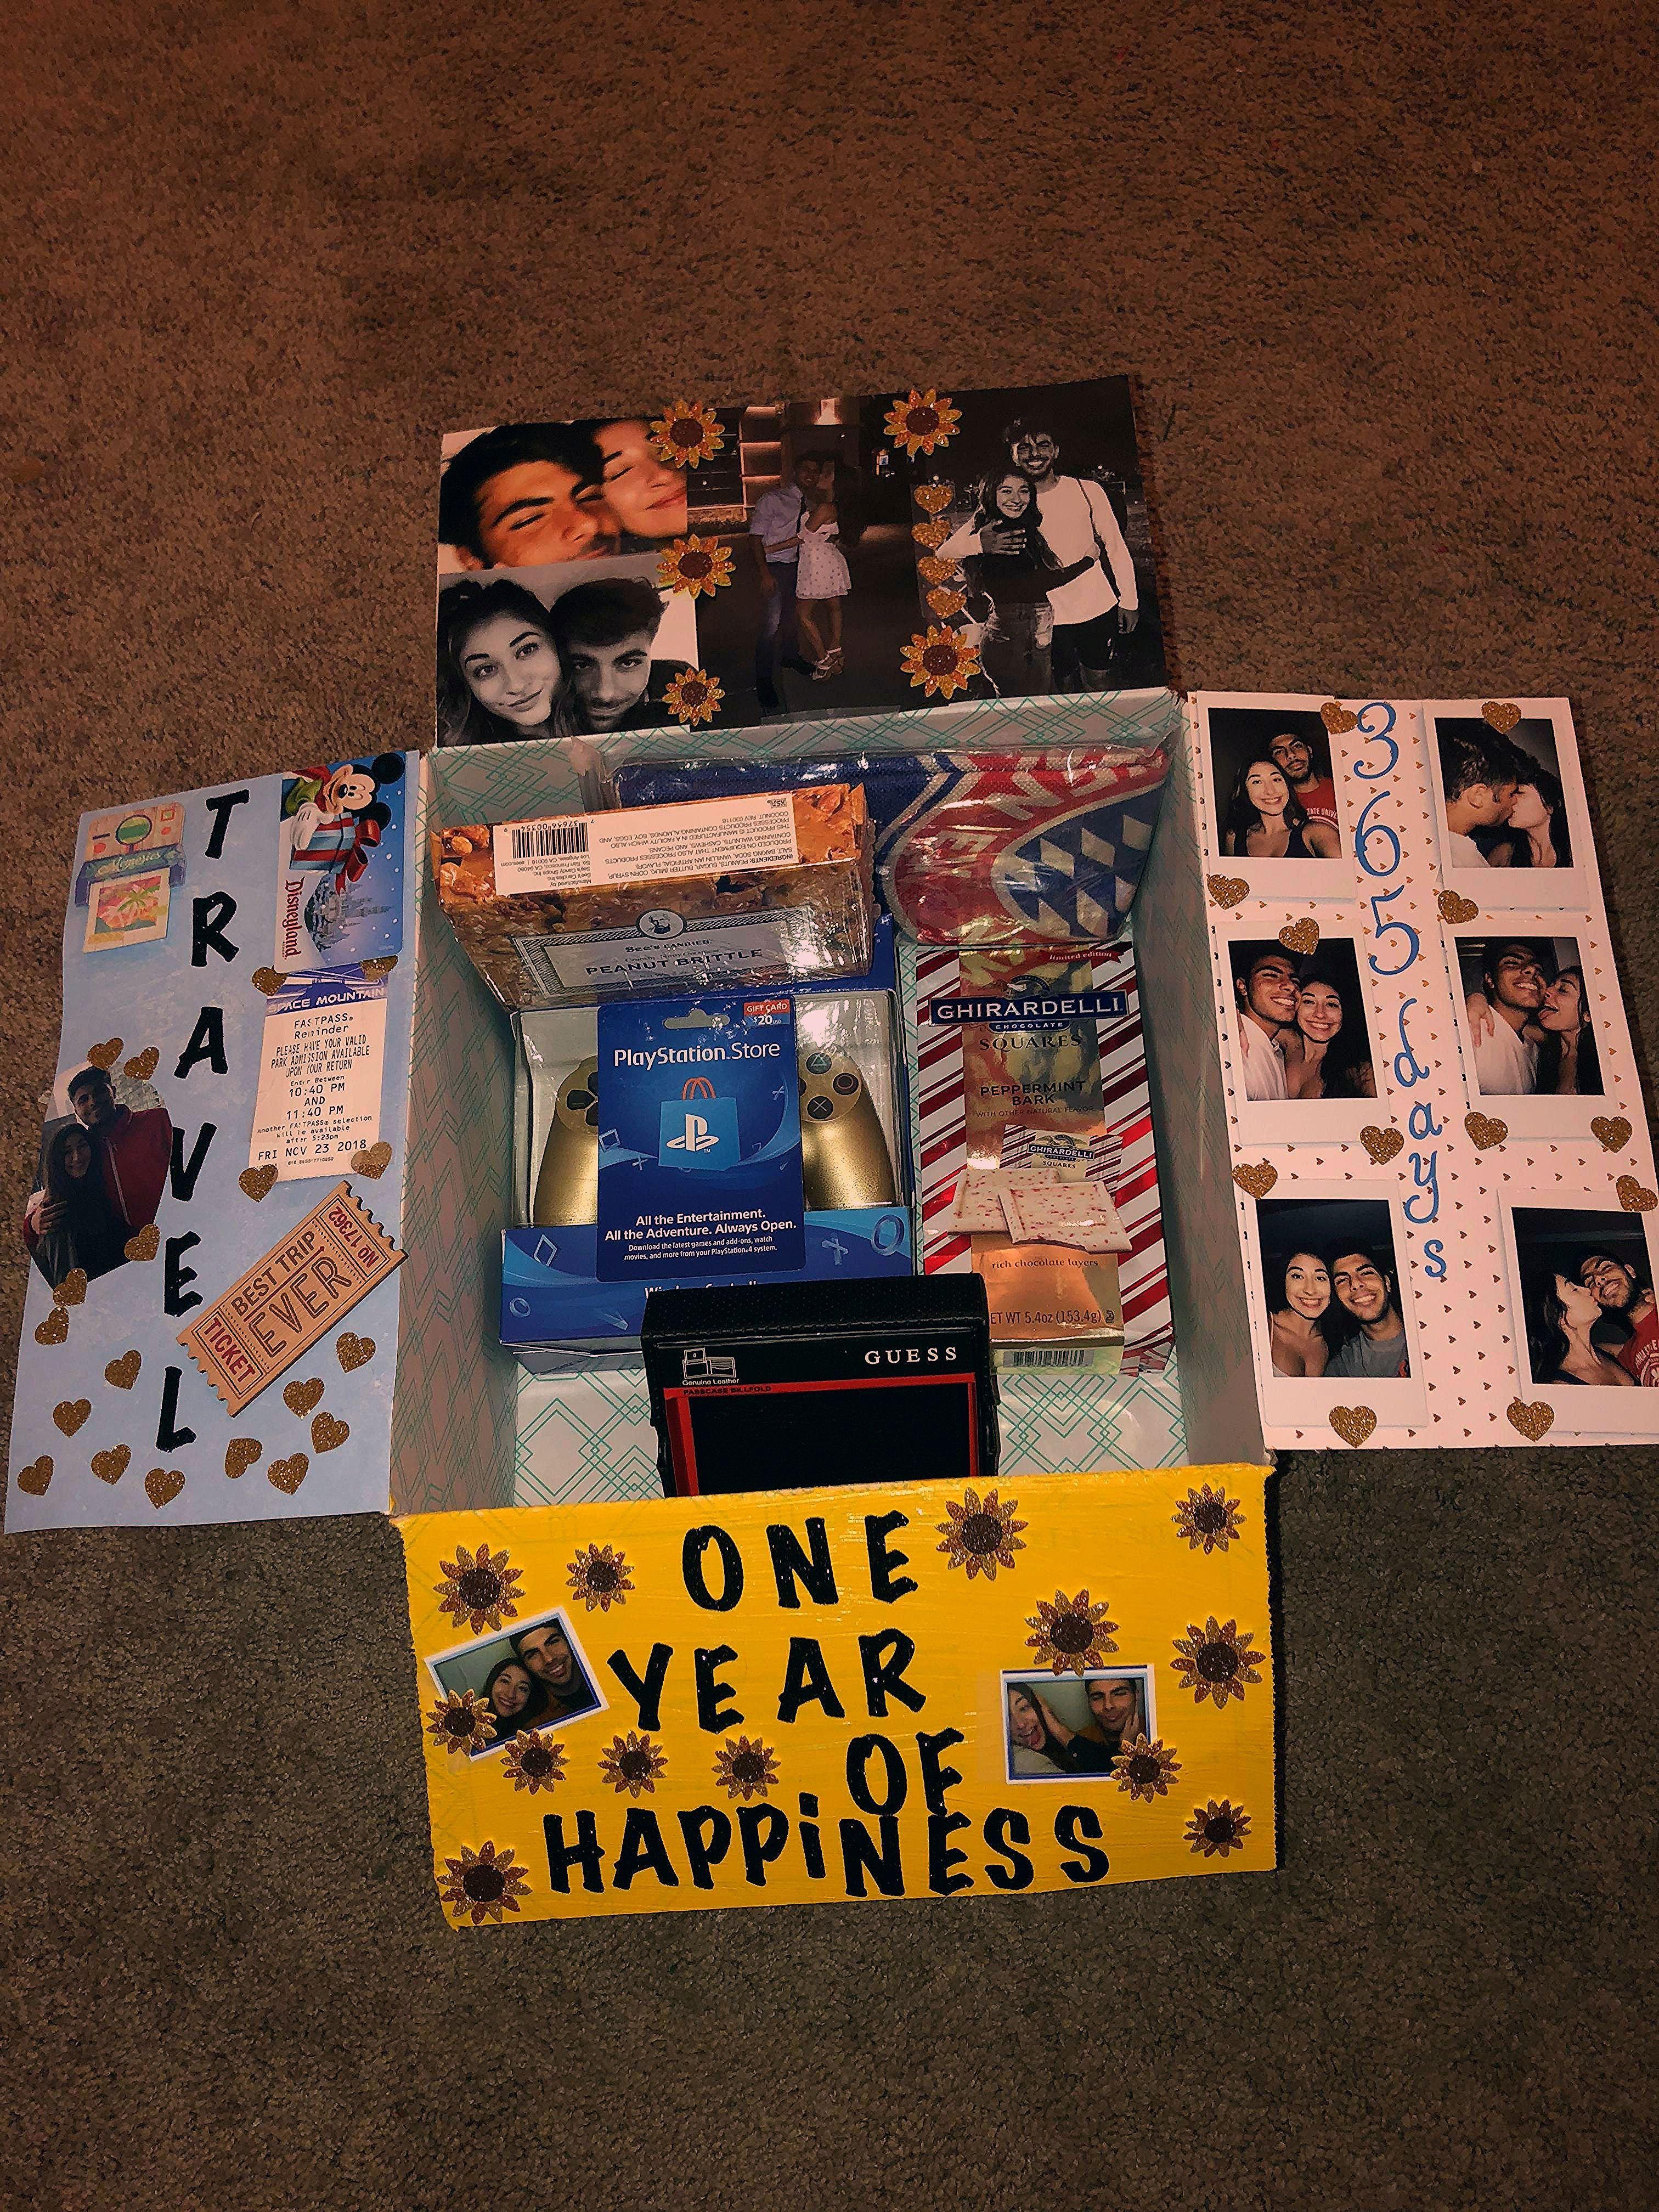 Pin By Shir Salit On Sweet Gifting Creative Birthday Gifts Birthday Gifts For Boyfriend Boyfriend Gifts